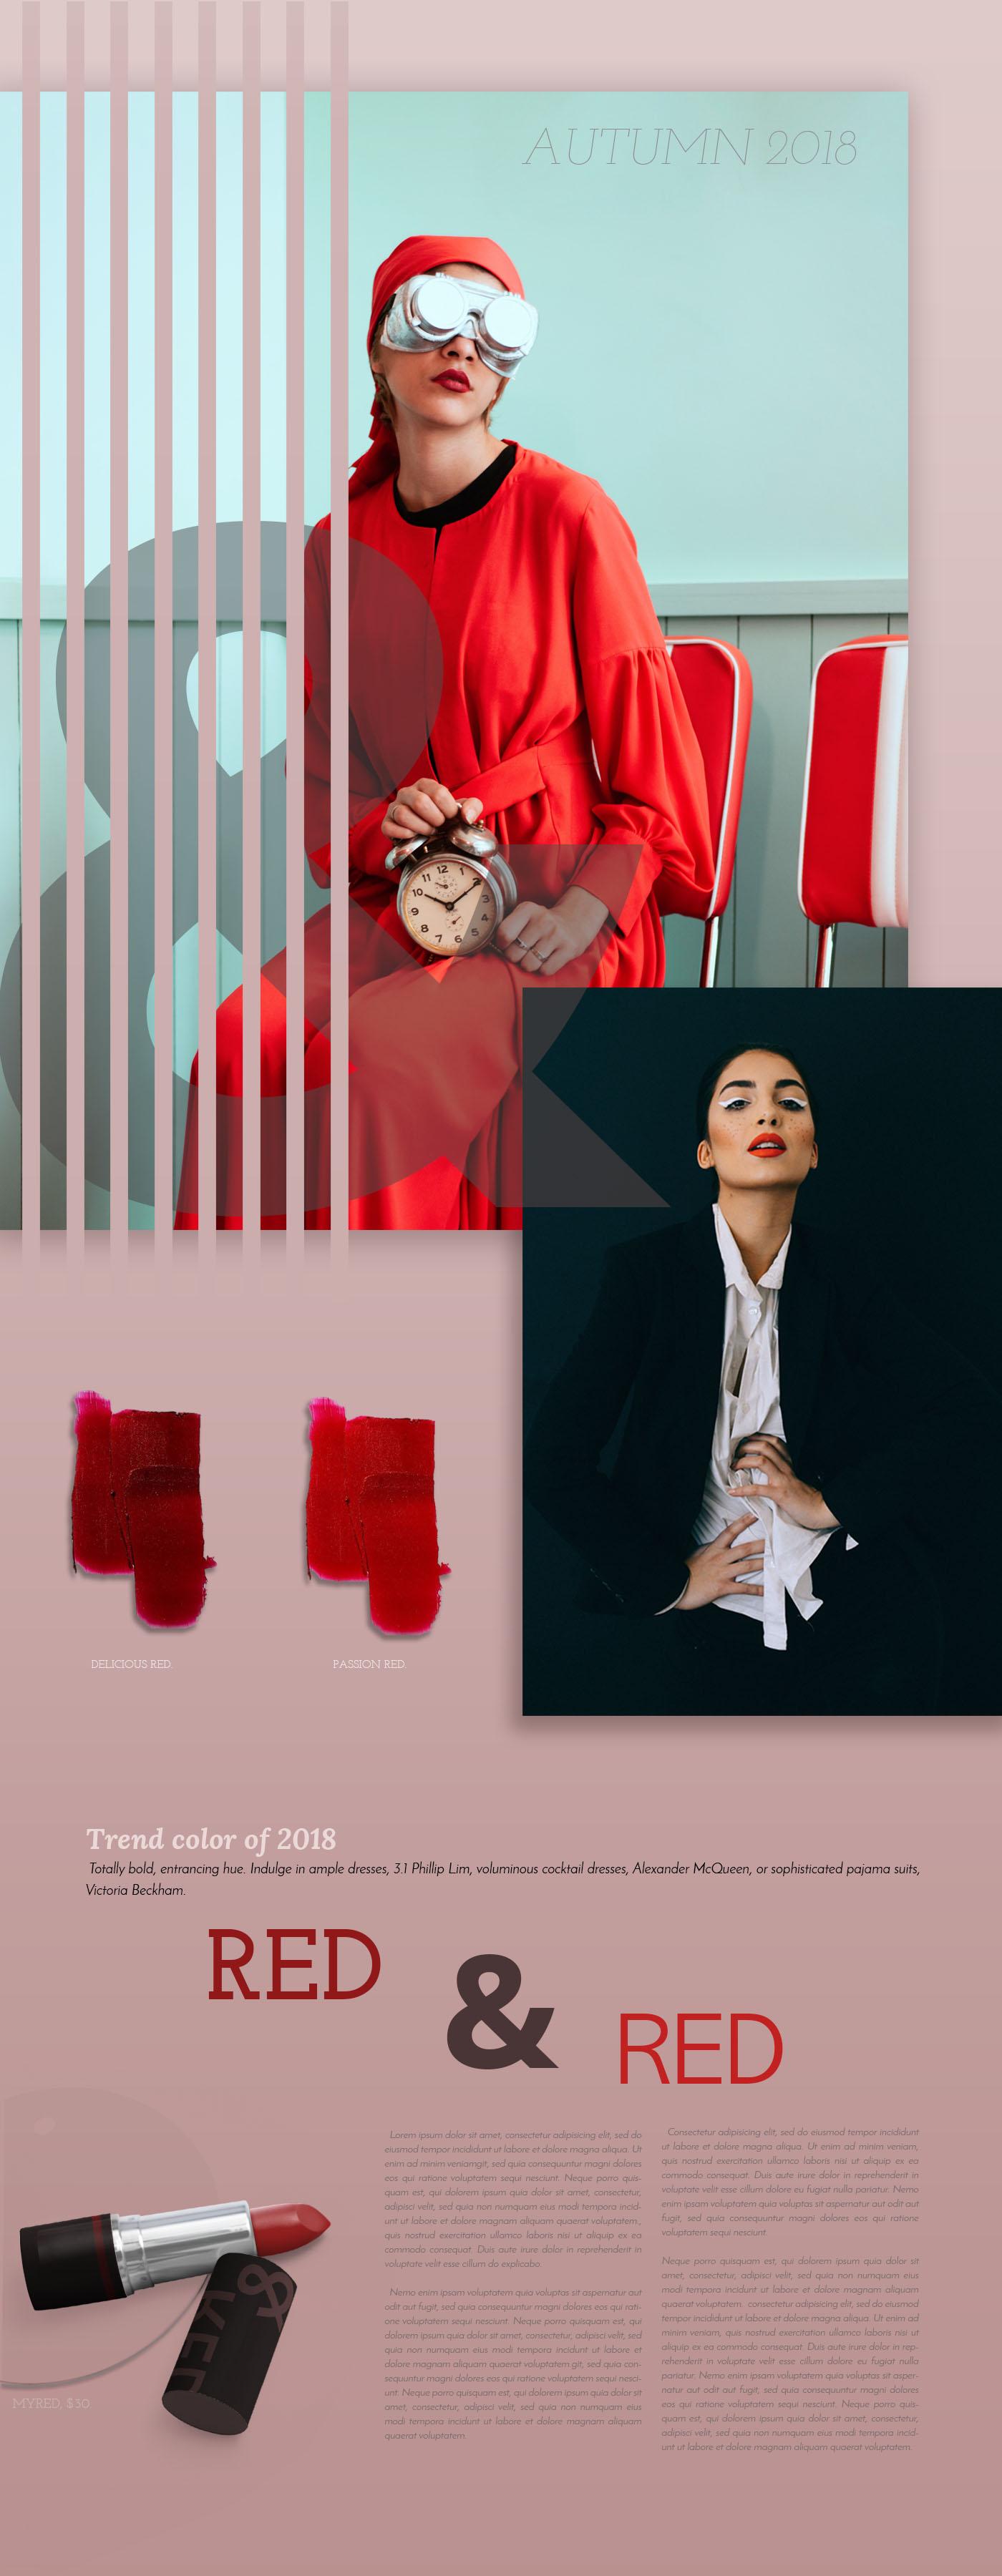 Autumn 2018 - Red Lipstick trends